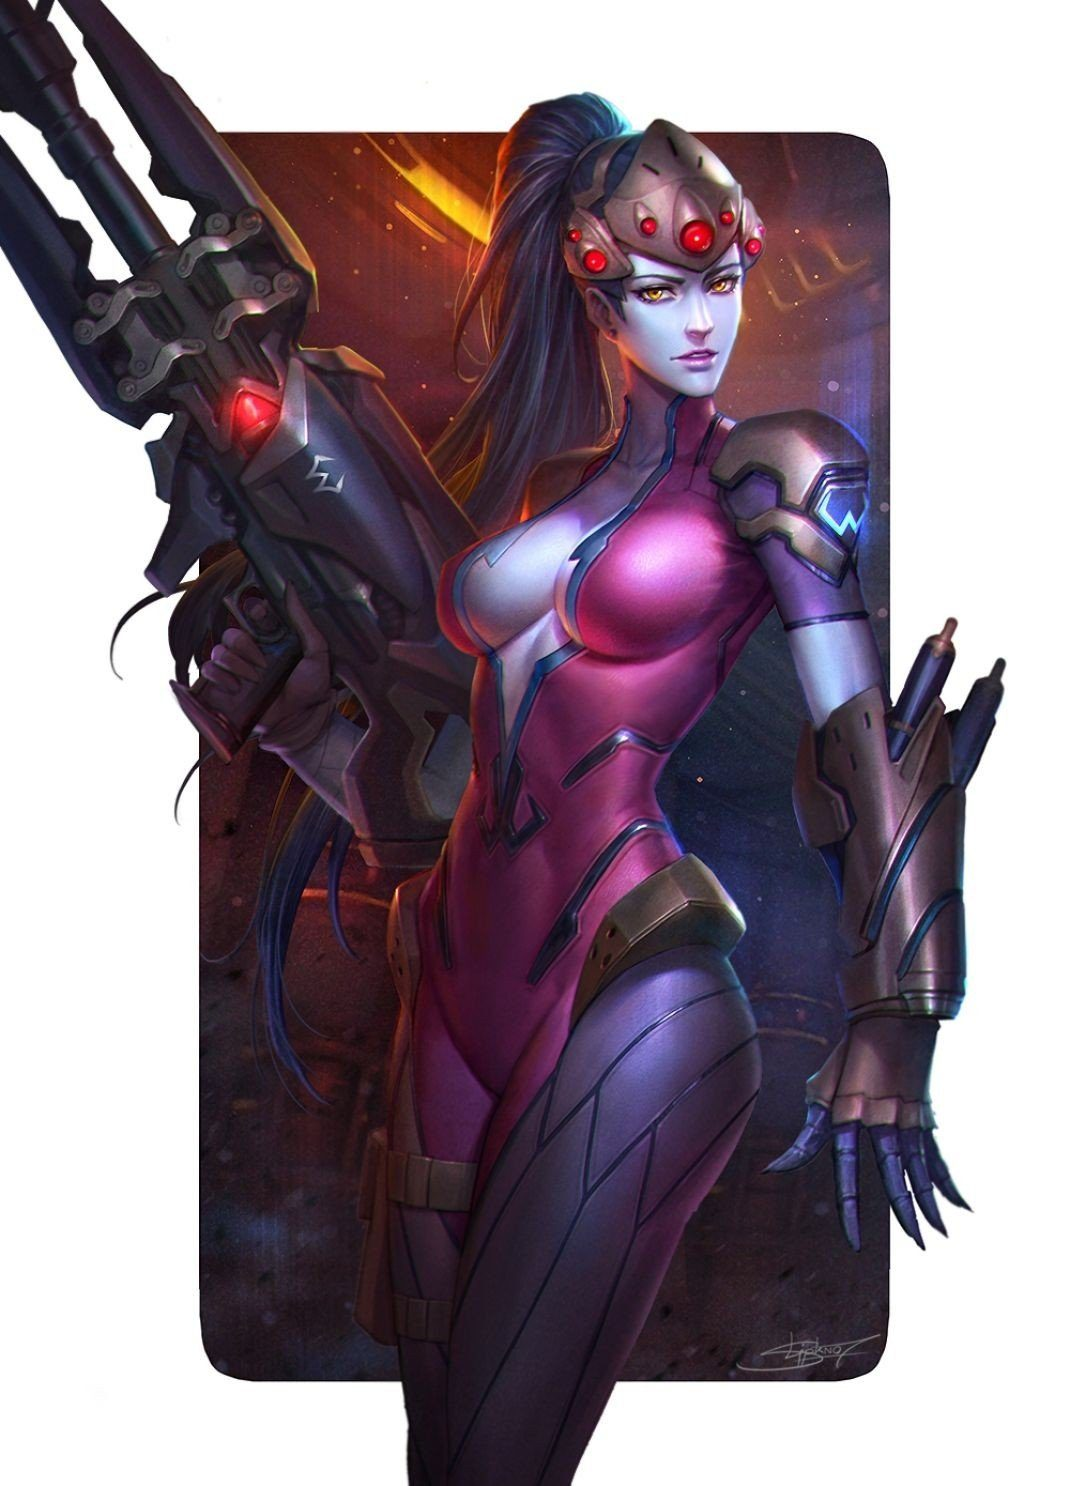 Overwatch Widowmaker clear background  boobs Widow hot